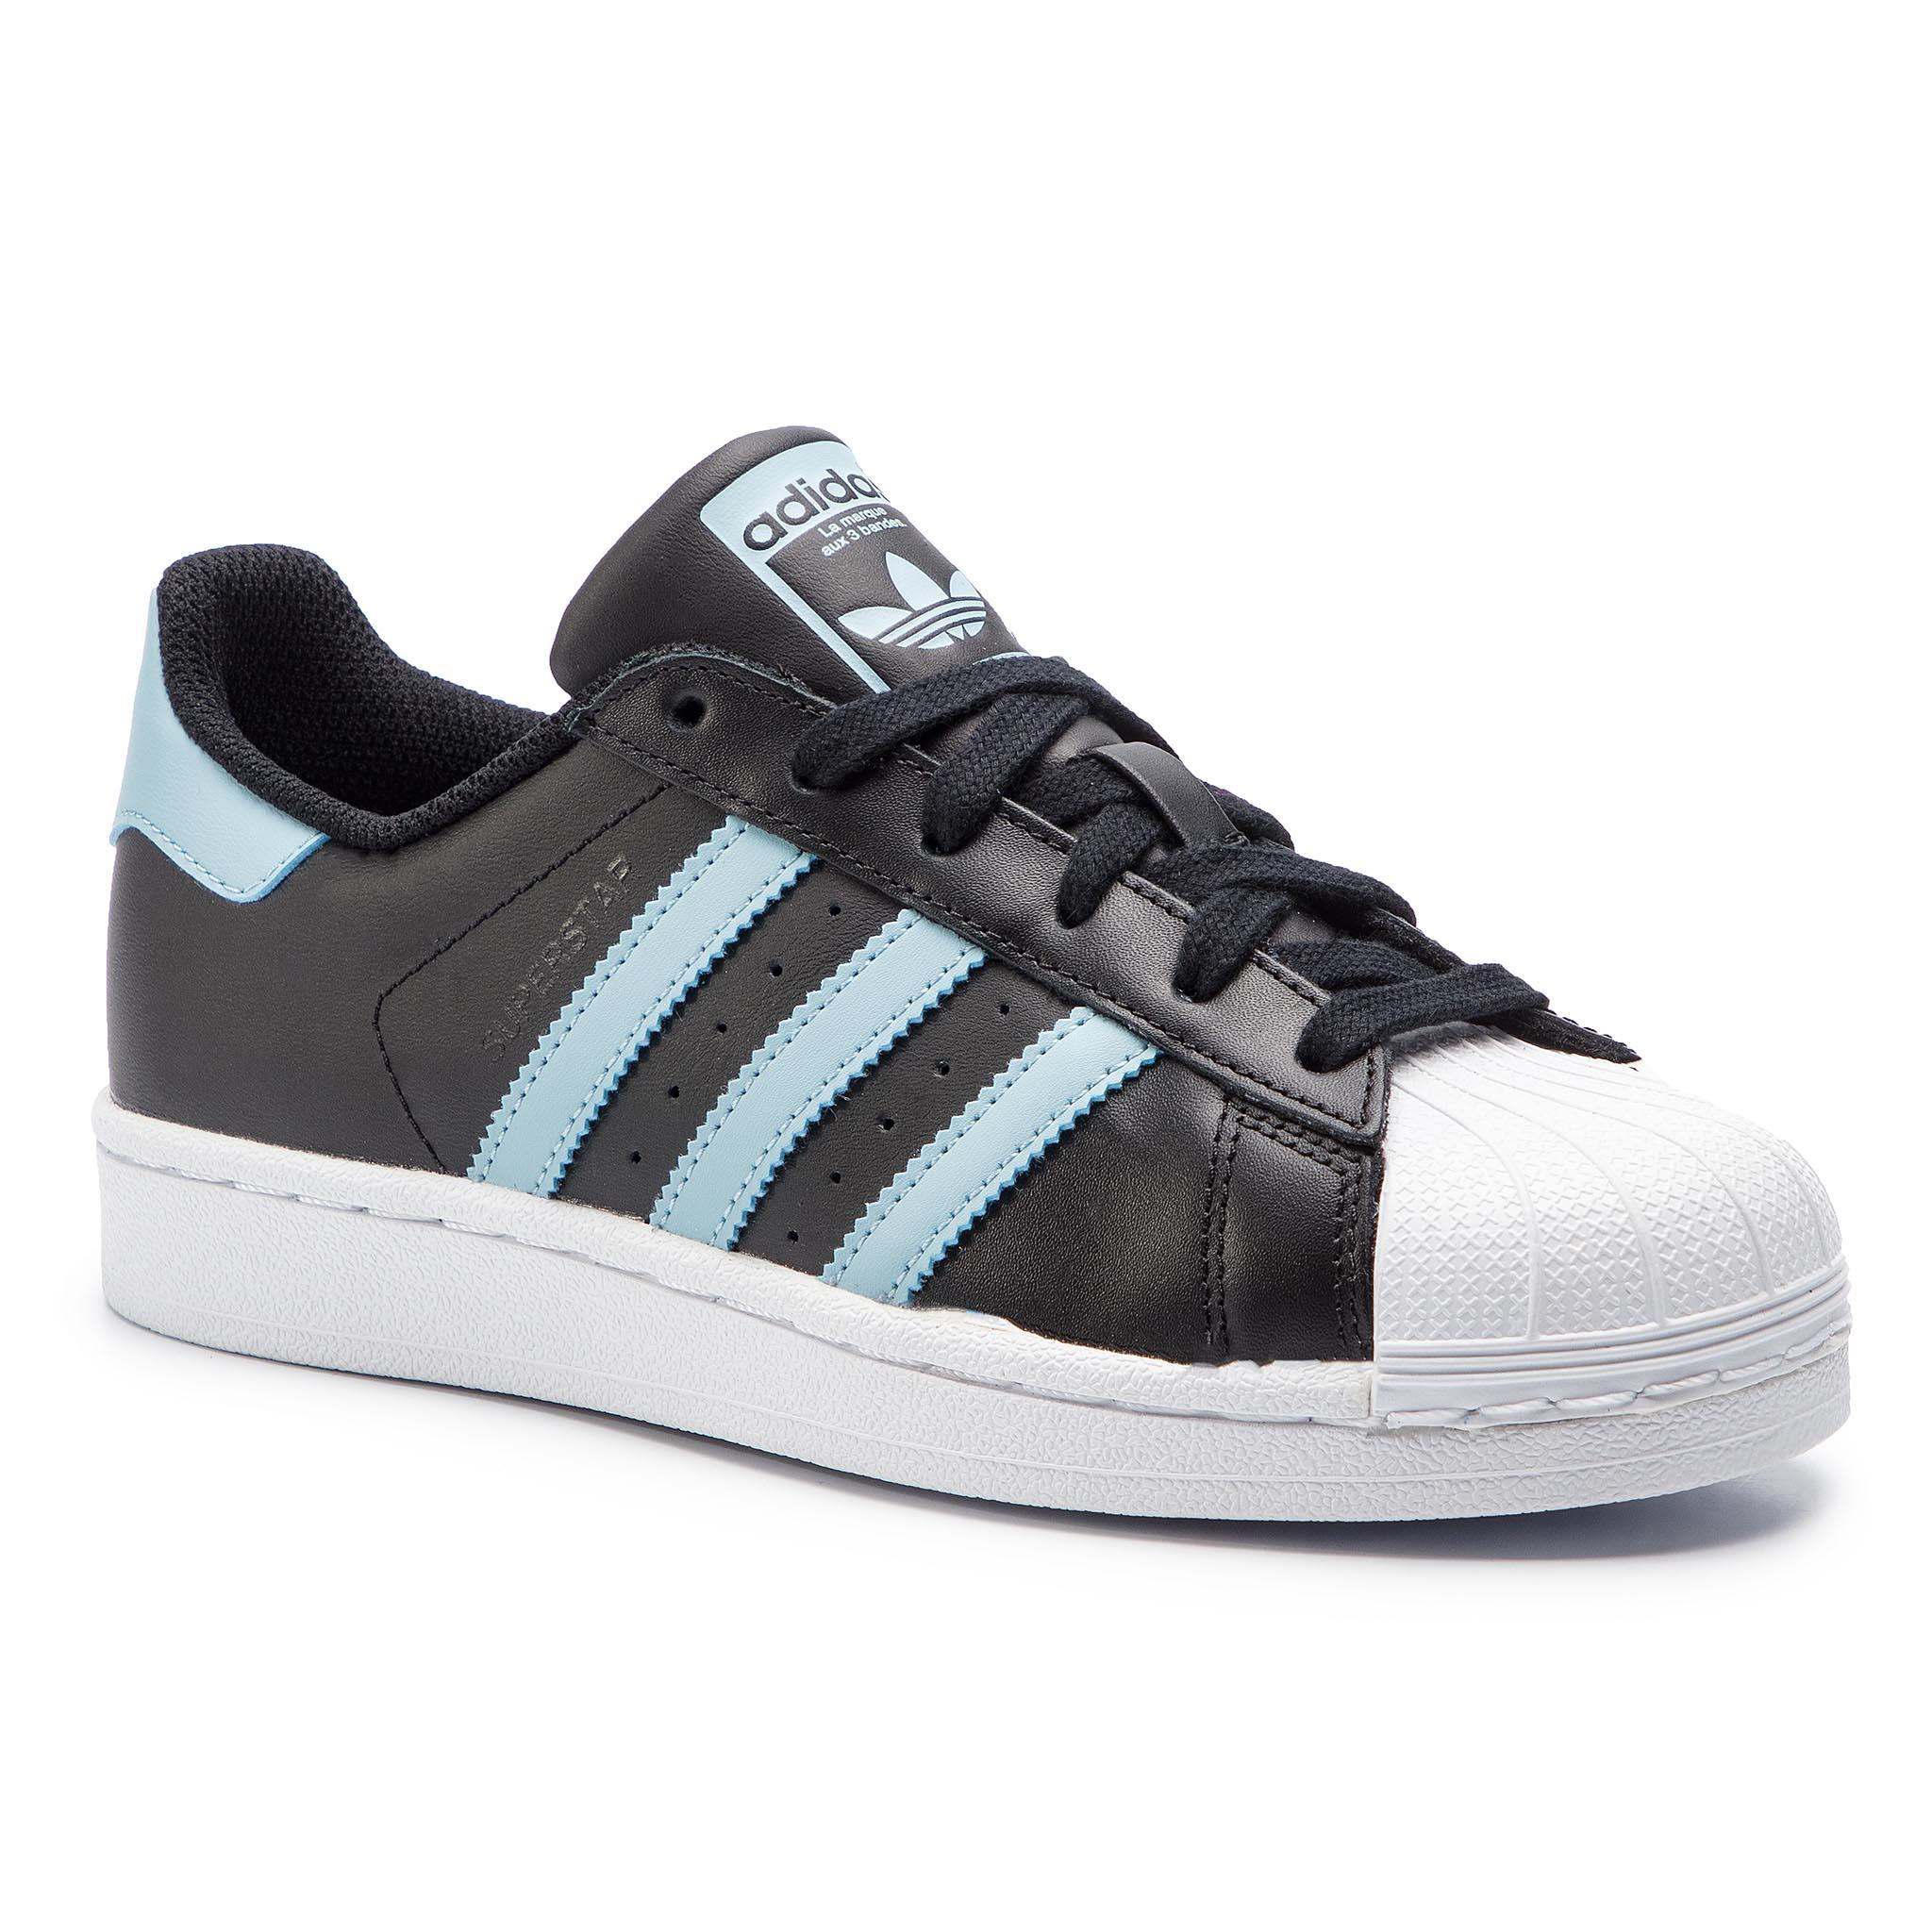 81005caa16528 Shoes adidas - Superstar B41994 Cblack Borang Ftwwht - Sneakers ...